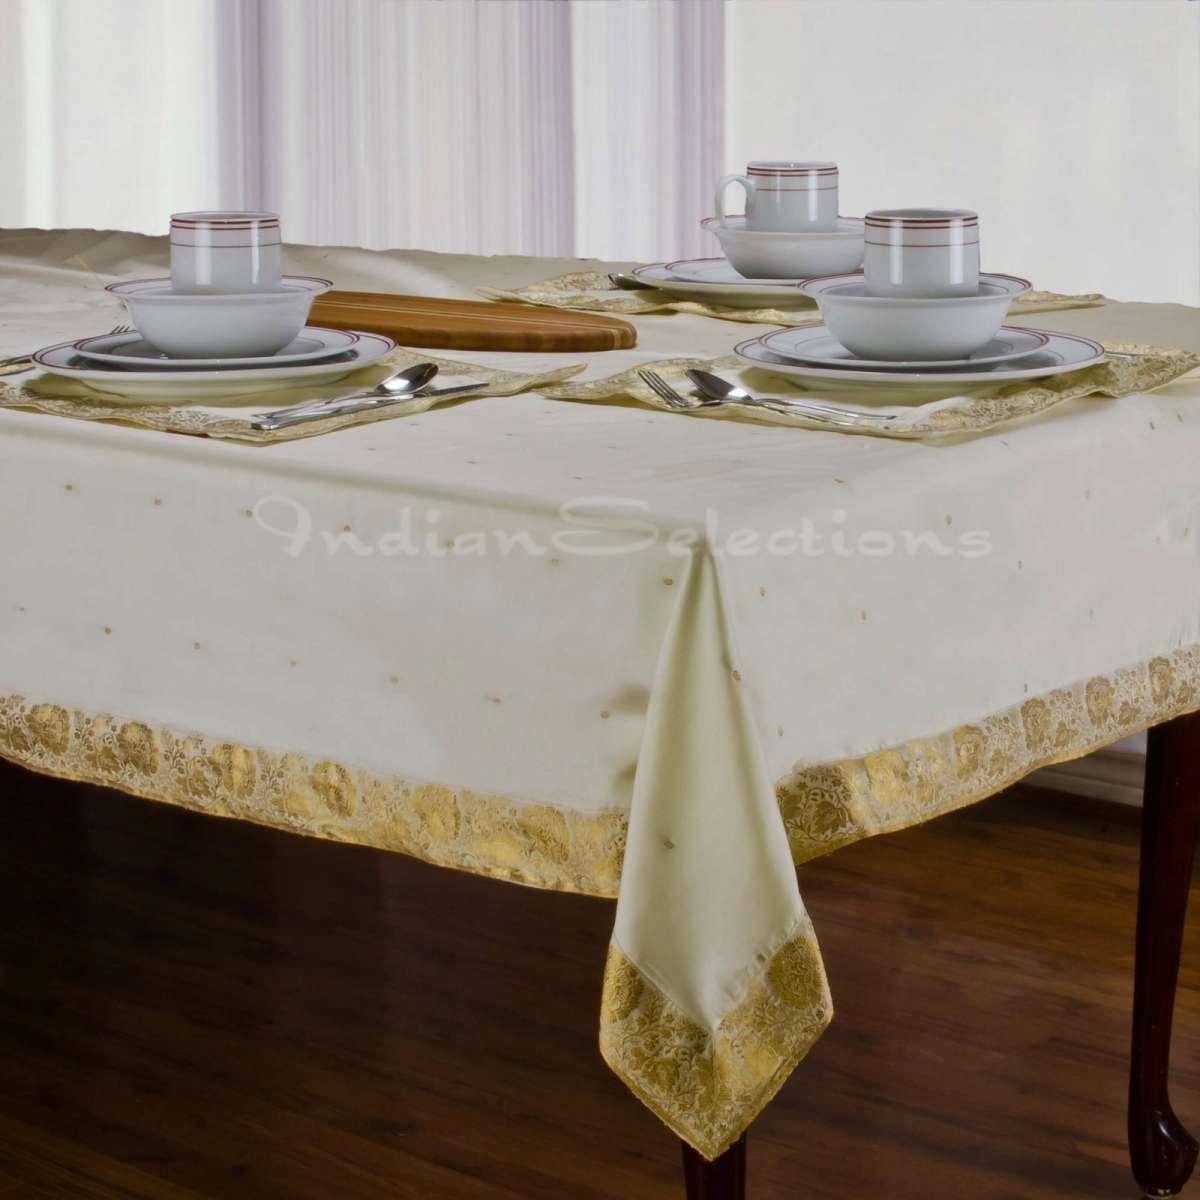 Cream - Handmade Sari Oblong Tablecloth (India) - 60 x 144'' with 10 Napkins